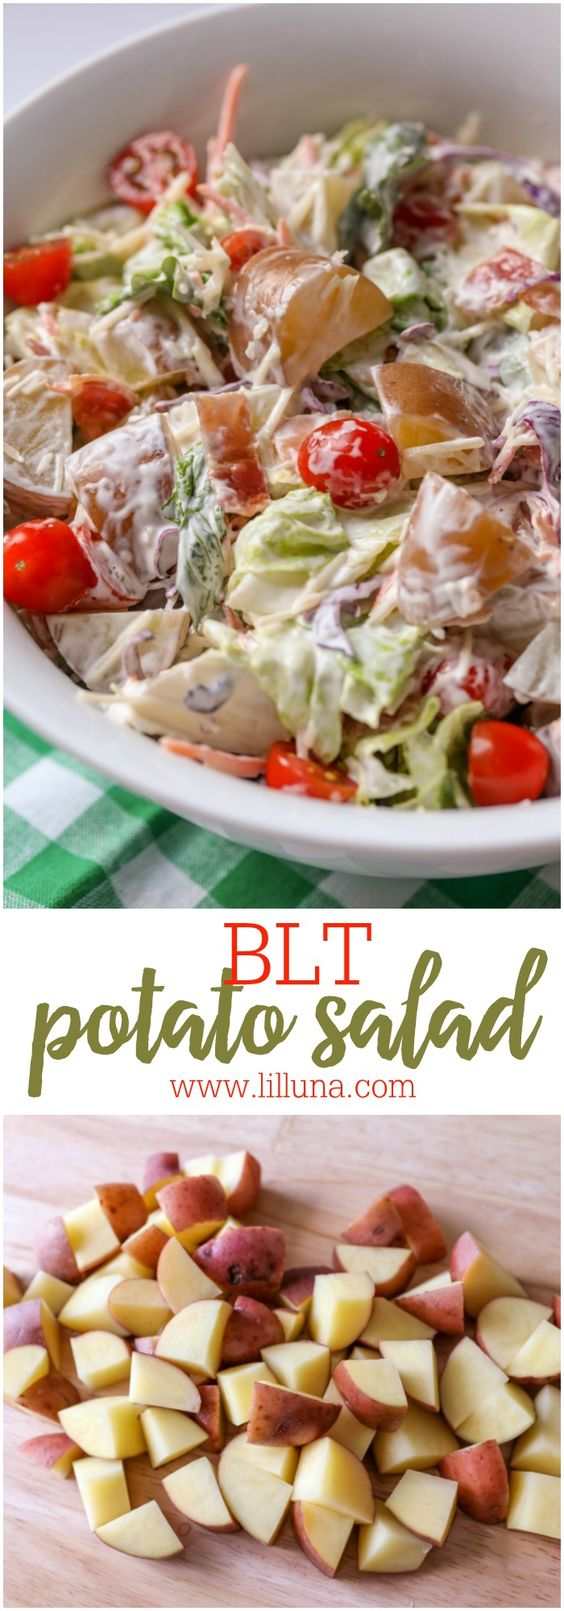 salad potatoes potatoes bacon and more potato salad lettuce and tomato ...